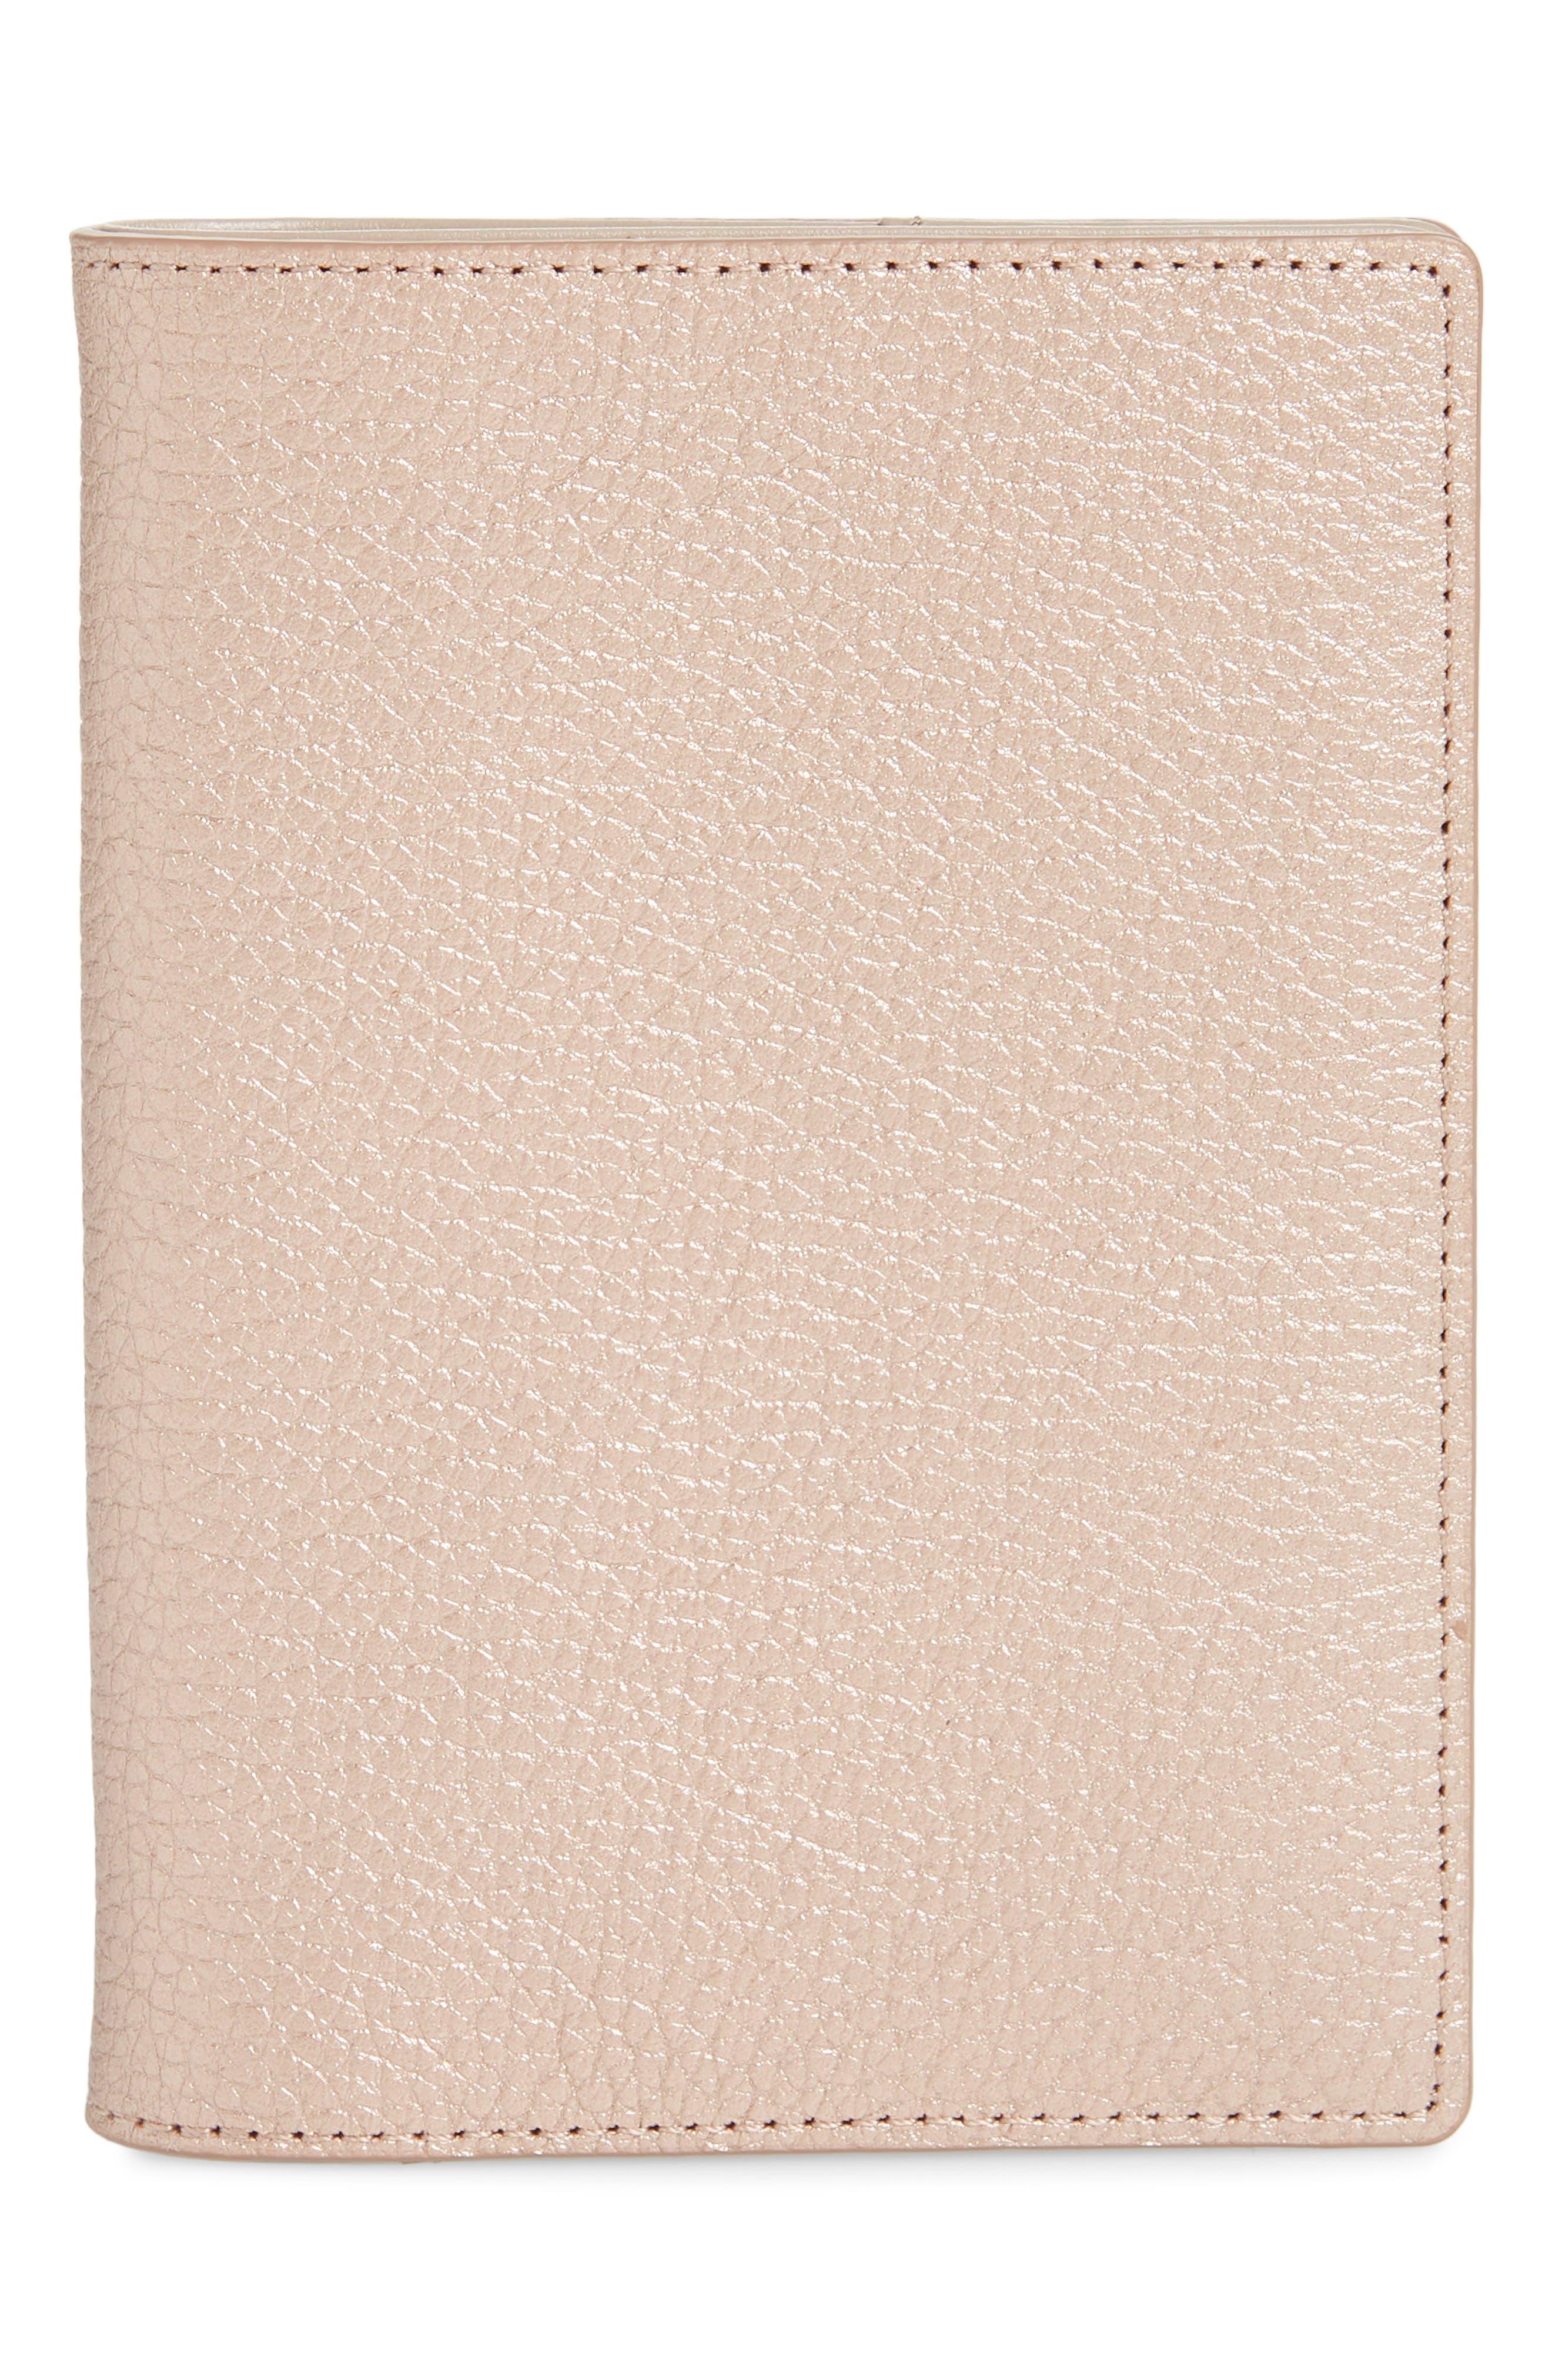 Leather Passport Case,                             Main thumbnail 1, color,                             ROSE GOLD